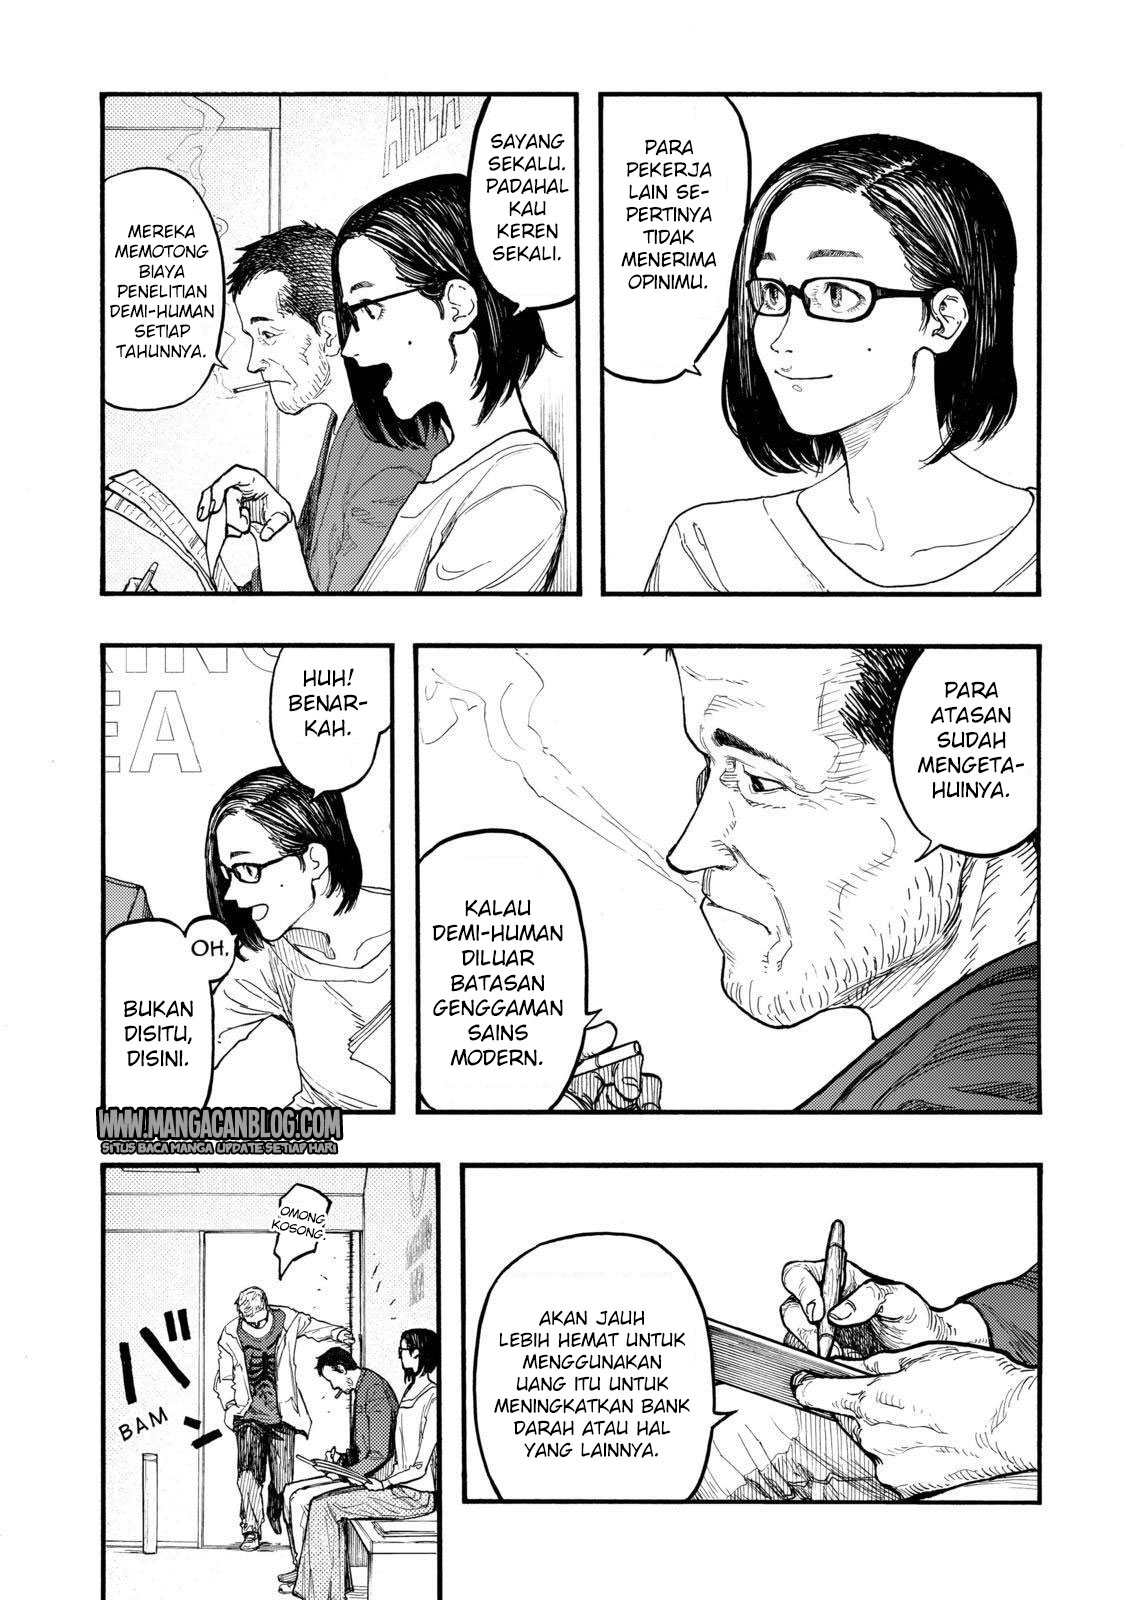 Dilarang COPAS - situs resmi www.mangacanblog.com - Komik ajin 046 - selamat pagi, sampai jumpa besok 47 Indonesia ajin 046 - selamat pagi, sampai jumpa besok Terbaru 14|Baca Manga Komik Indonesia|Mangacan